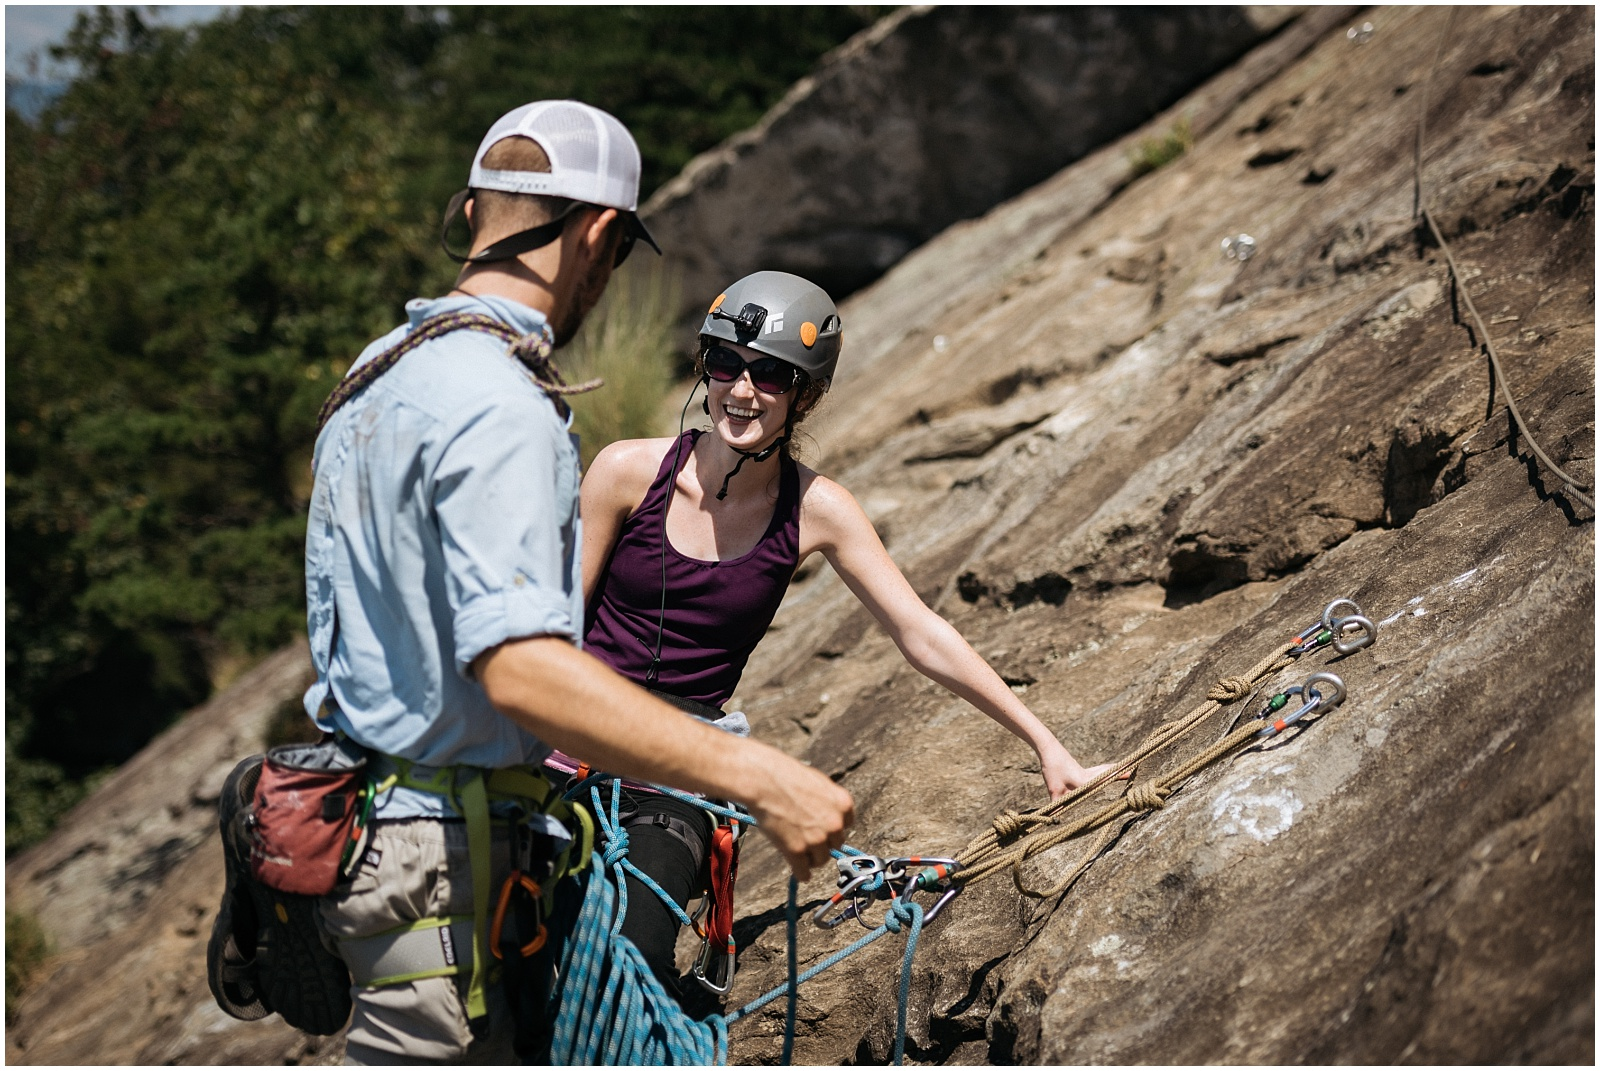 Candid rock climbing photo